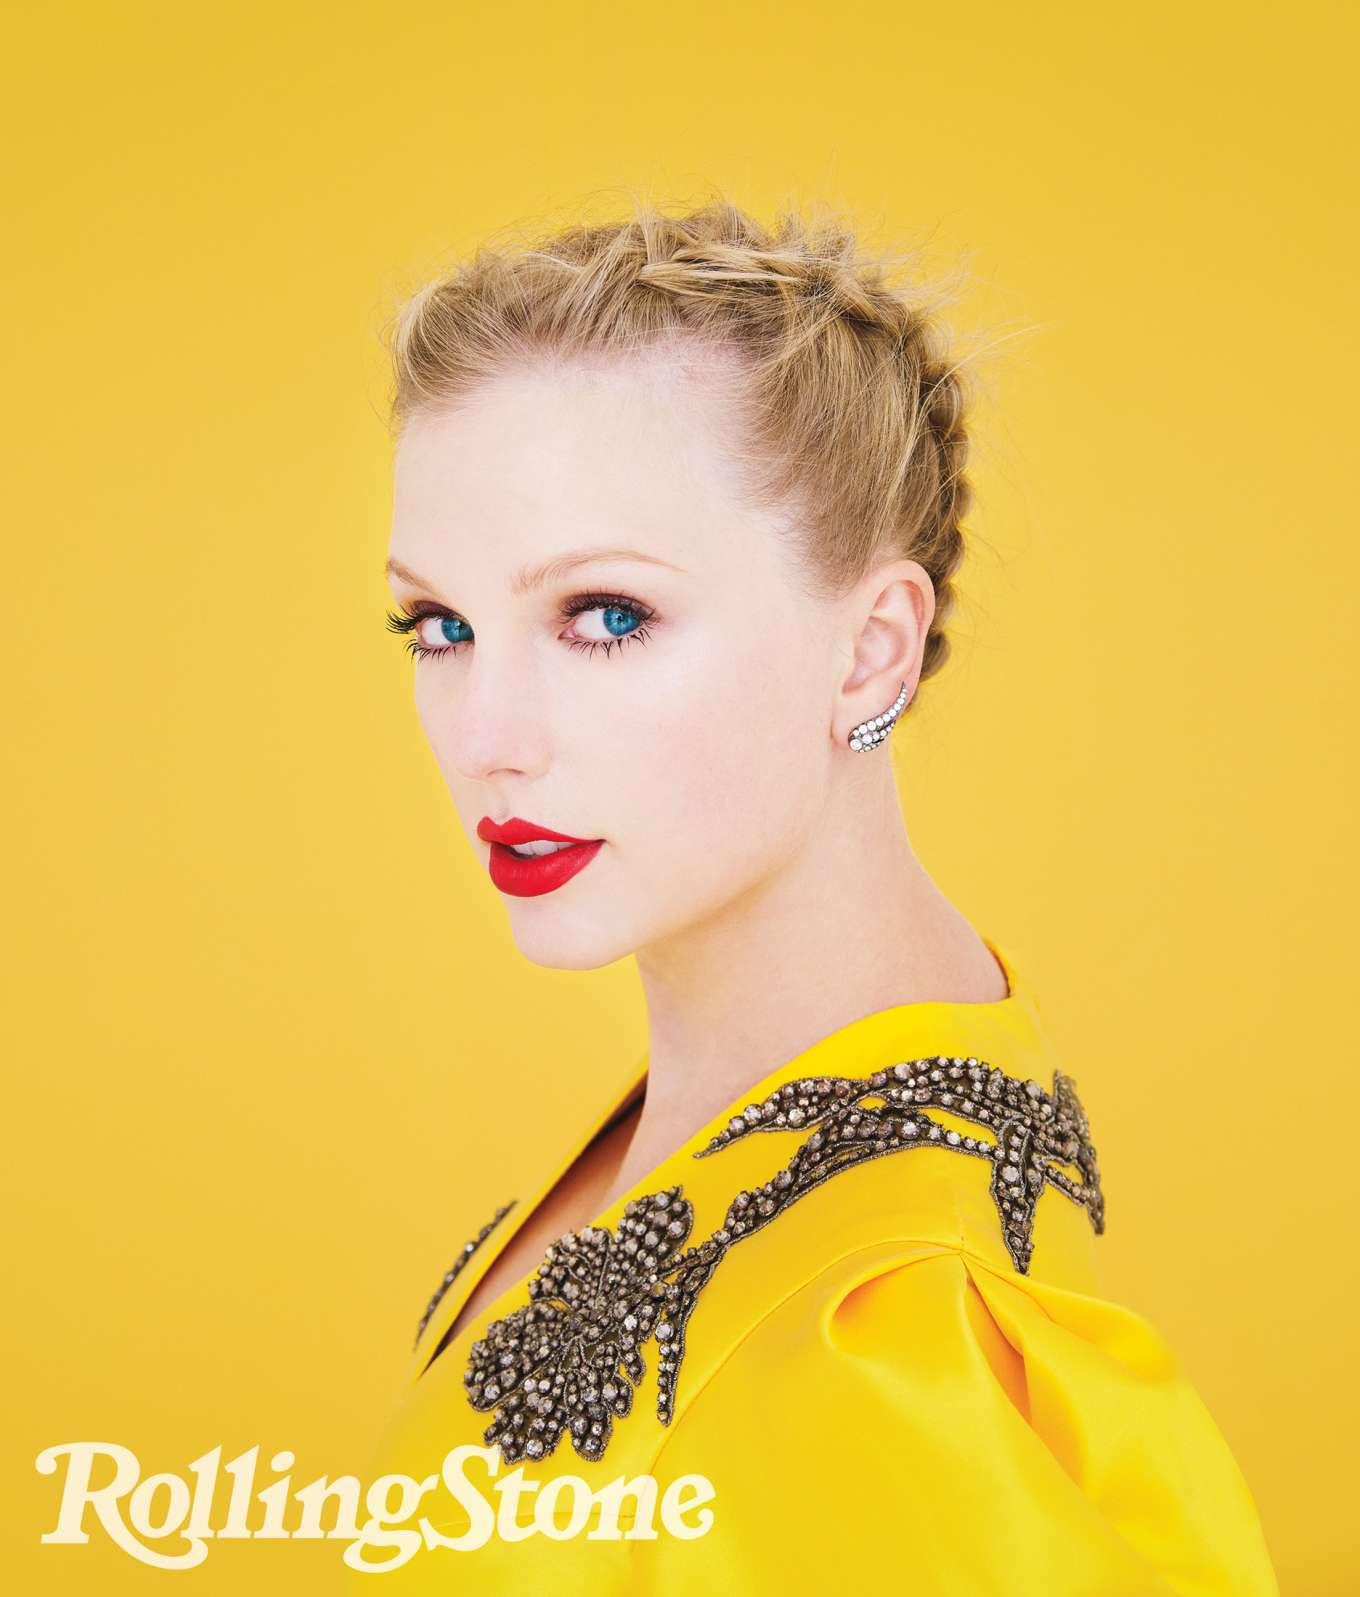 Taylor Swift - Rolling Stone Magazine (October 2019)